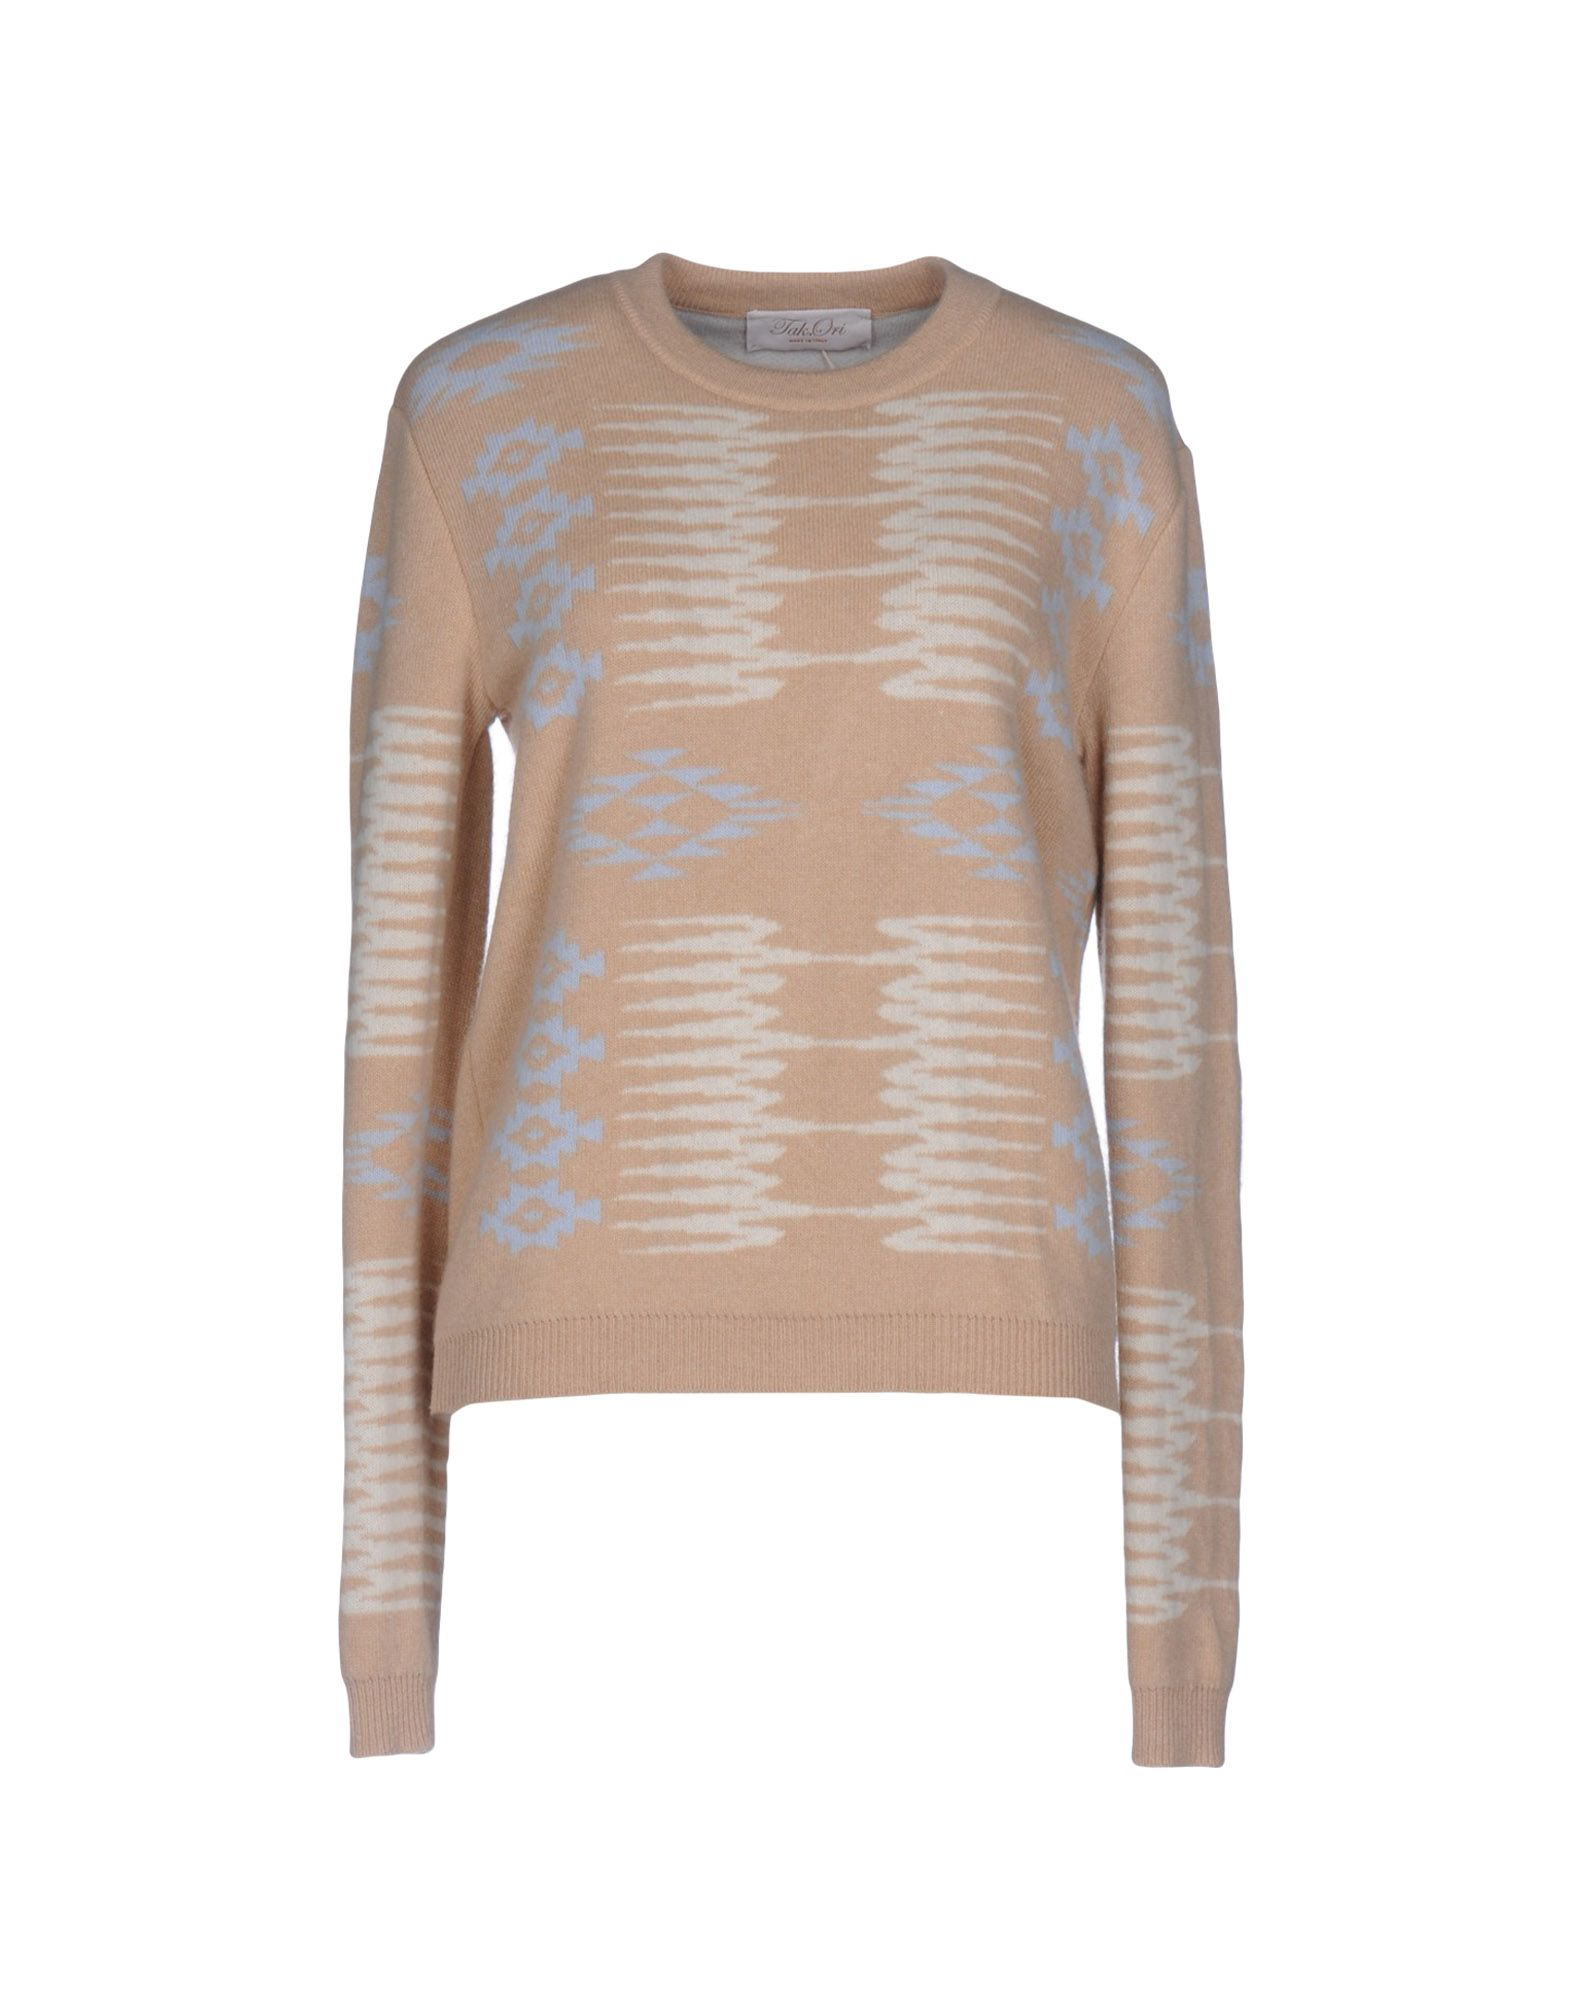 TAK.ORI Sweater in Sand